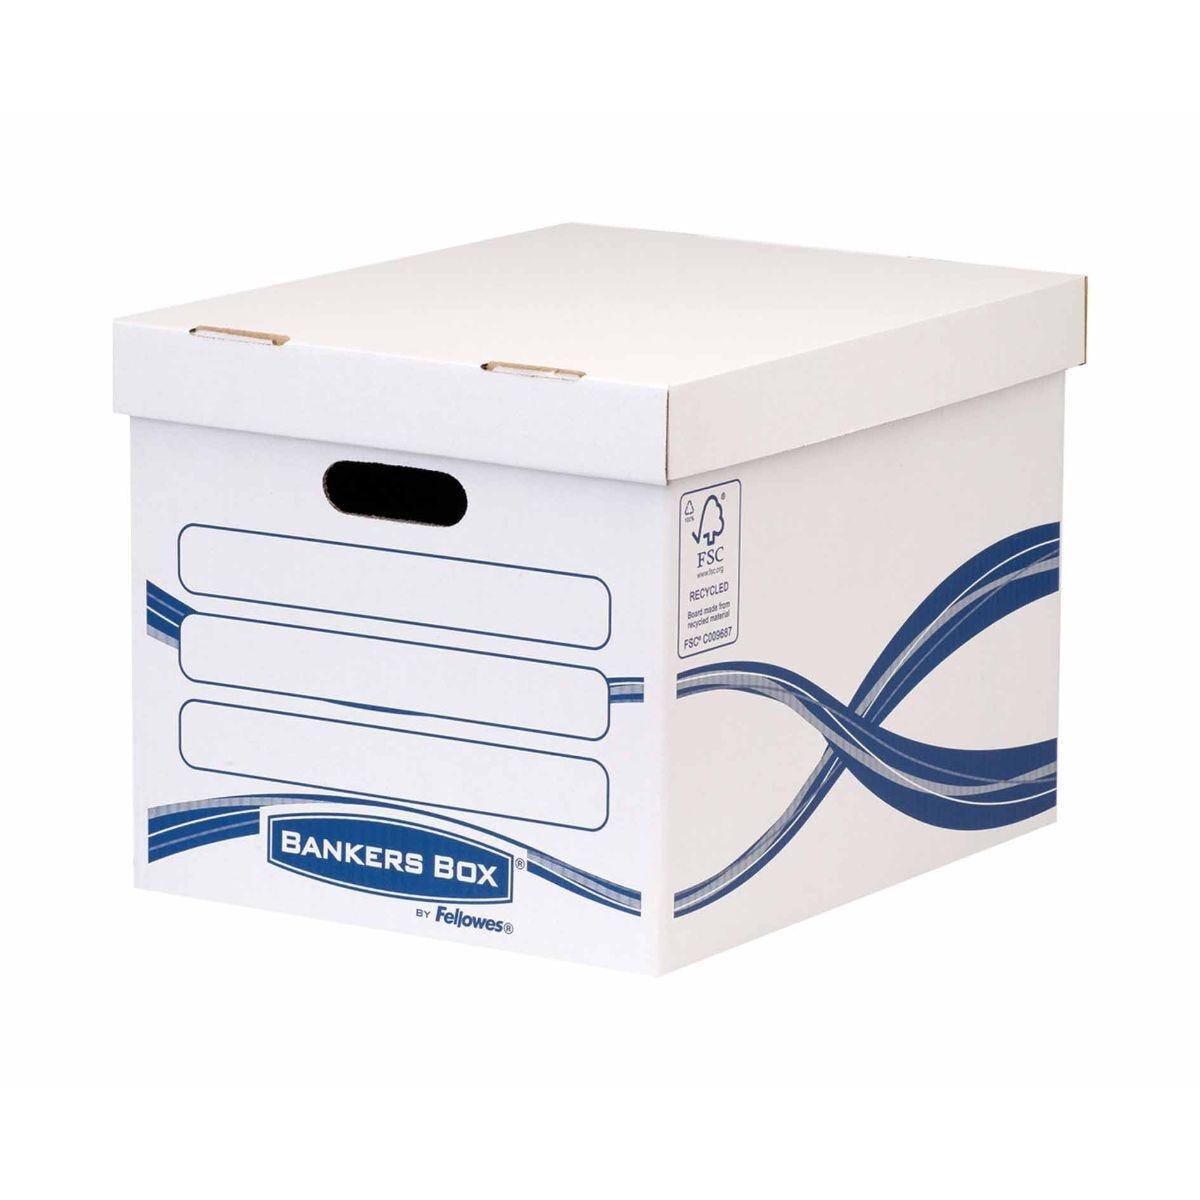 Fellowes Bankers Box Cardboard Storage Box Medium-Duty Pack of 3